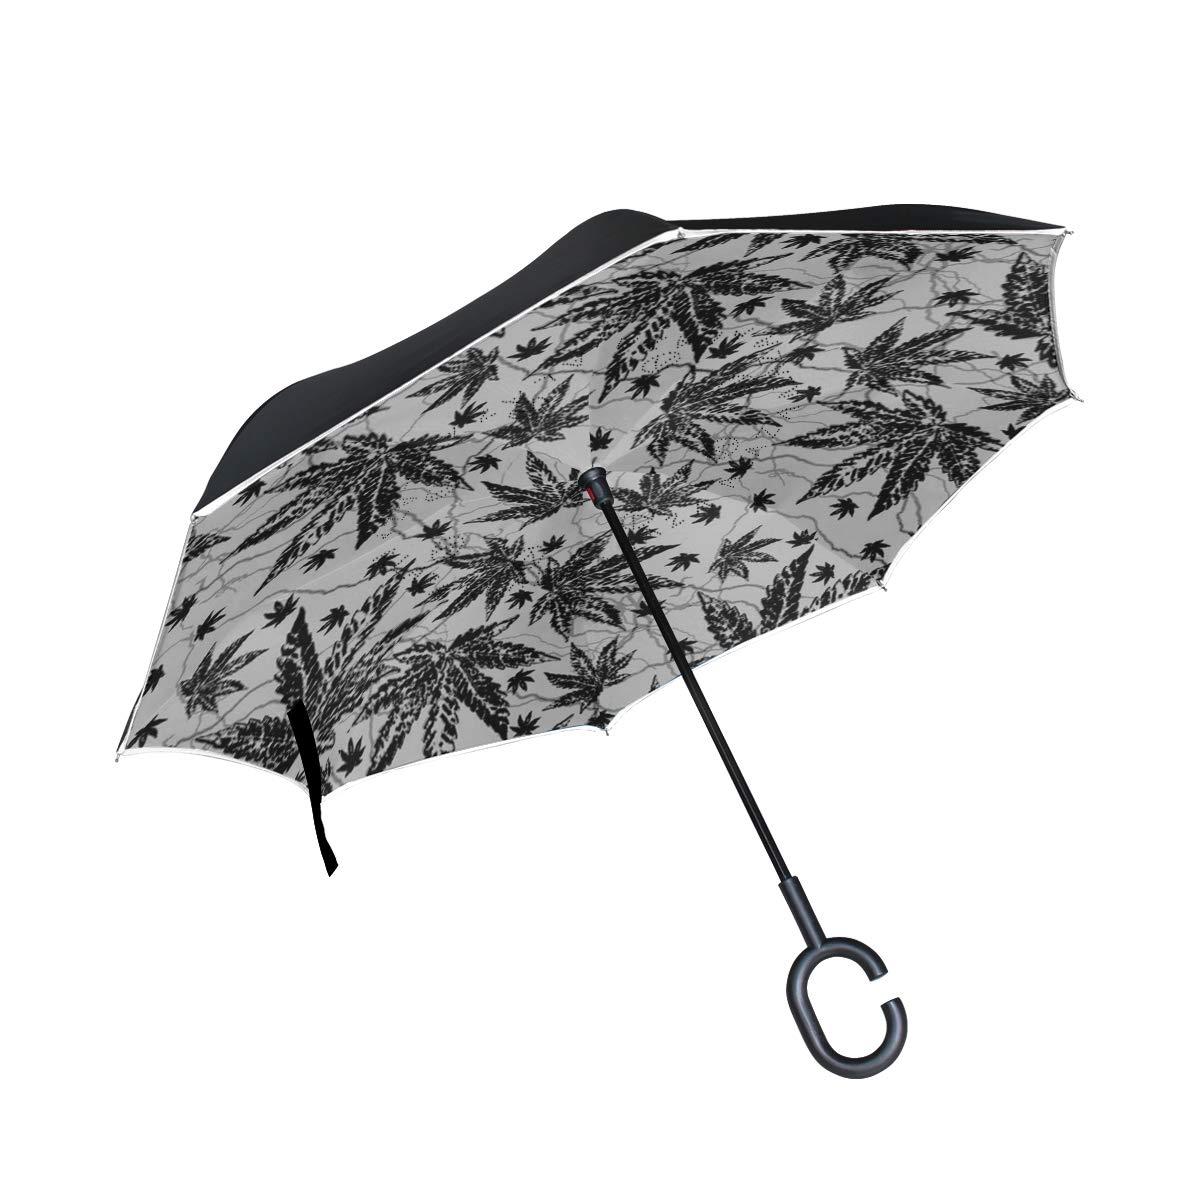 DOPKEEP Ganja Leaf ダブルレイヤー 反転傘 車 逆傘 UV保護 防風 大きなストレート傘 車 雨 屋外 C型ハンドル付き   B07GTK2TVR